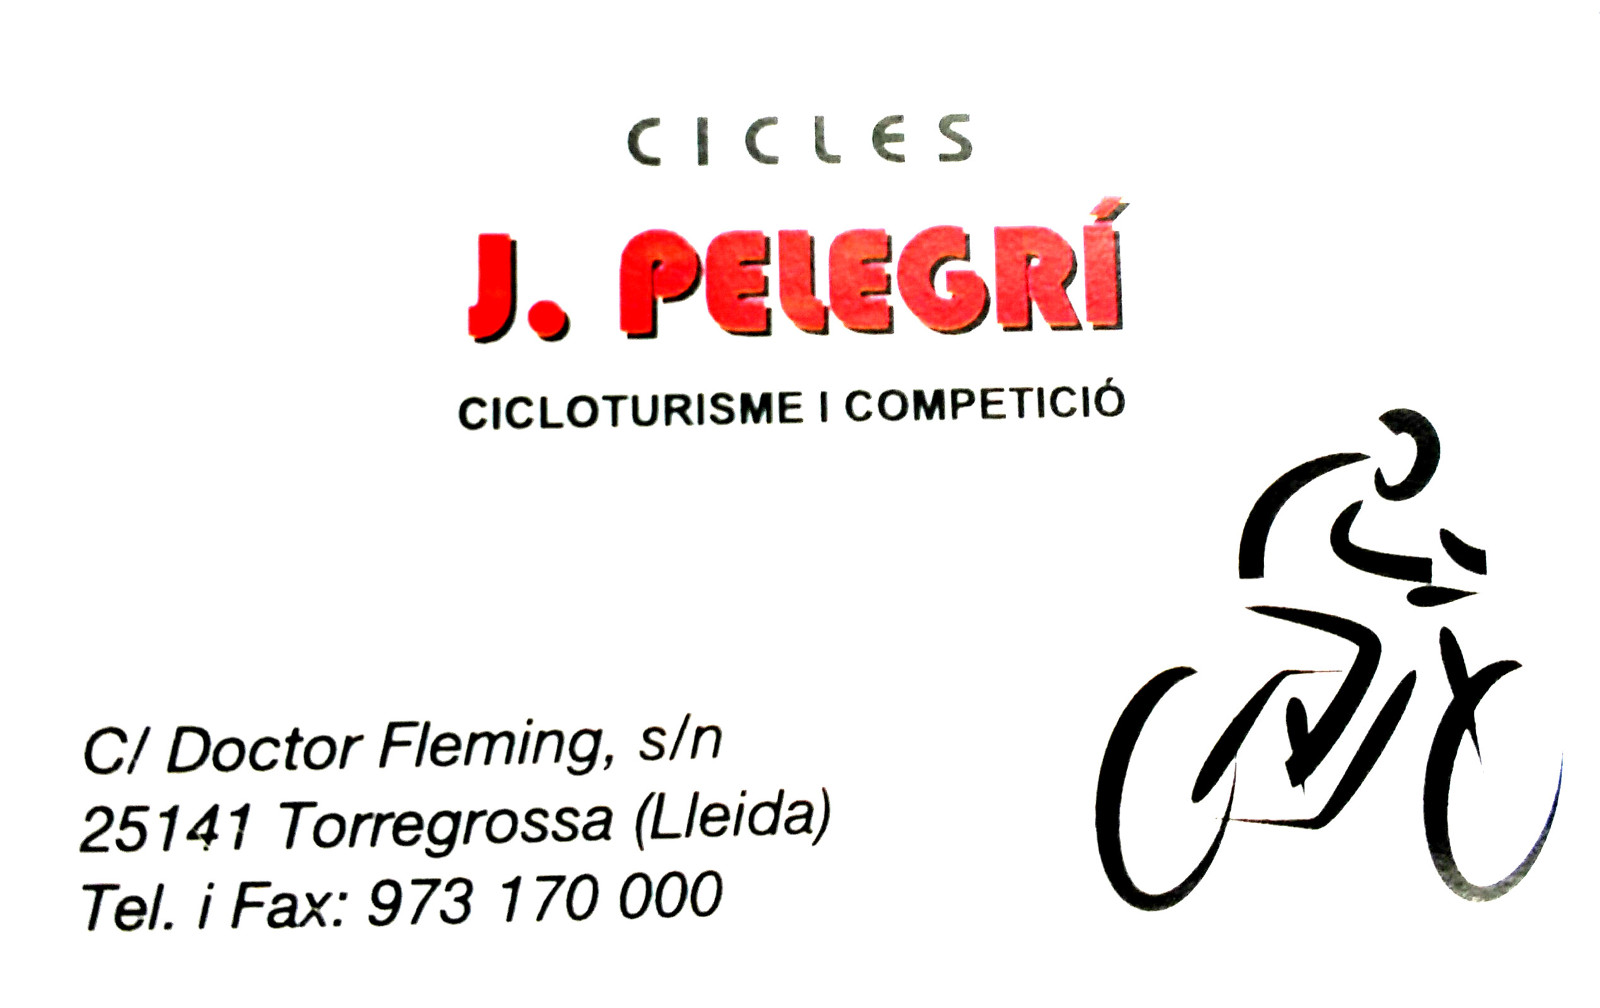 Cicles Pelegrí